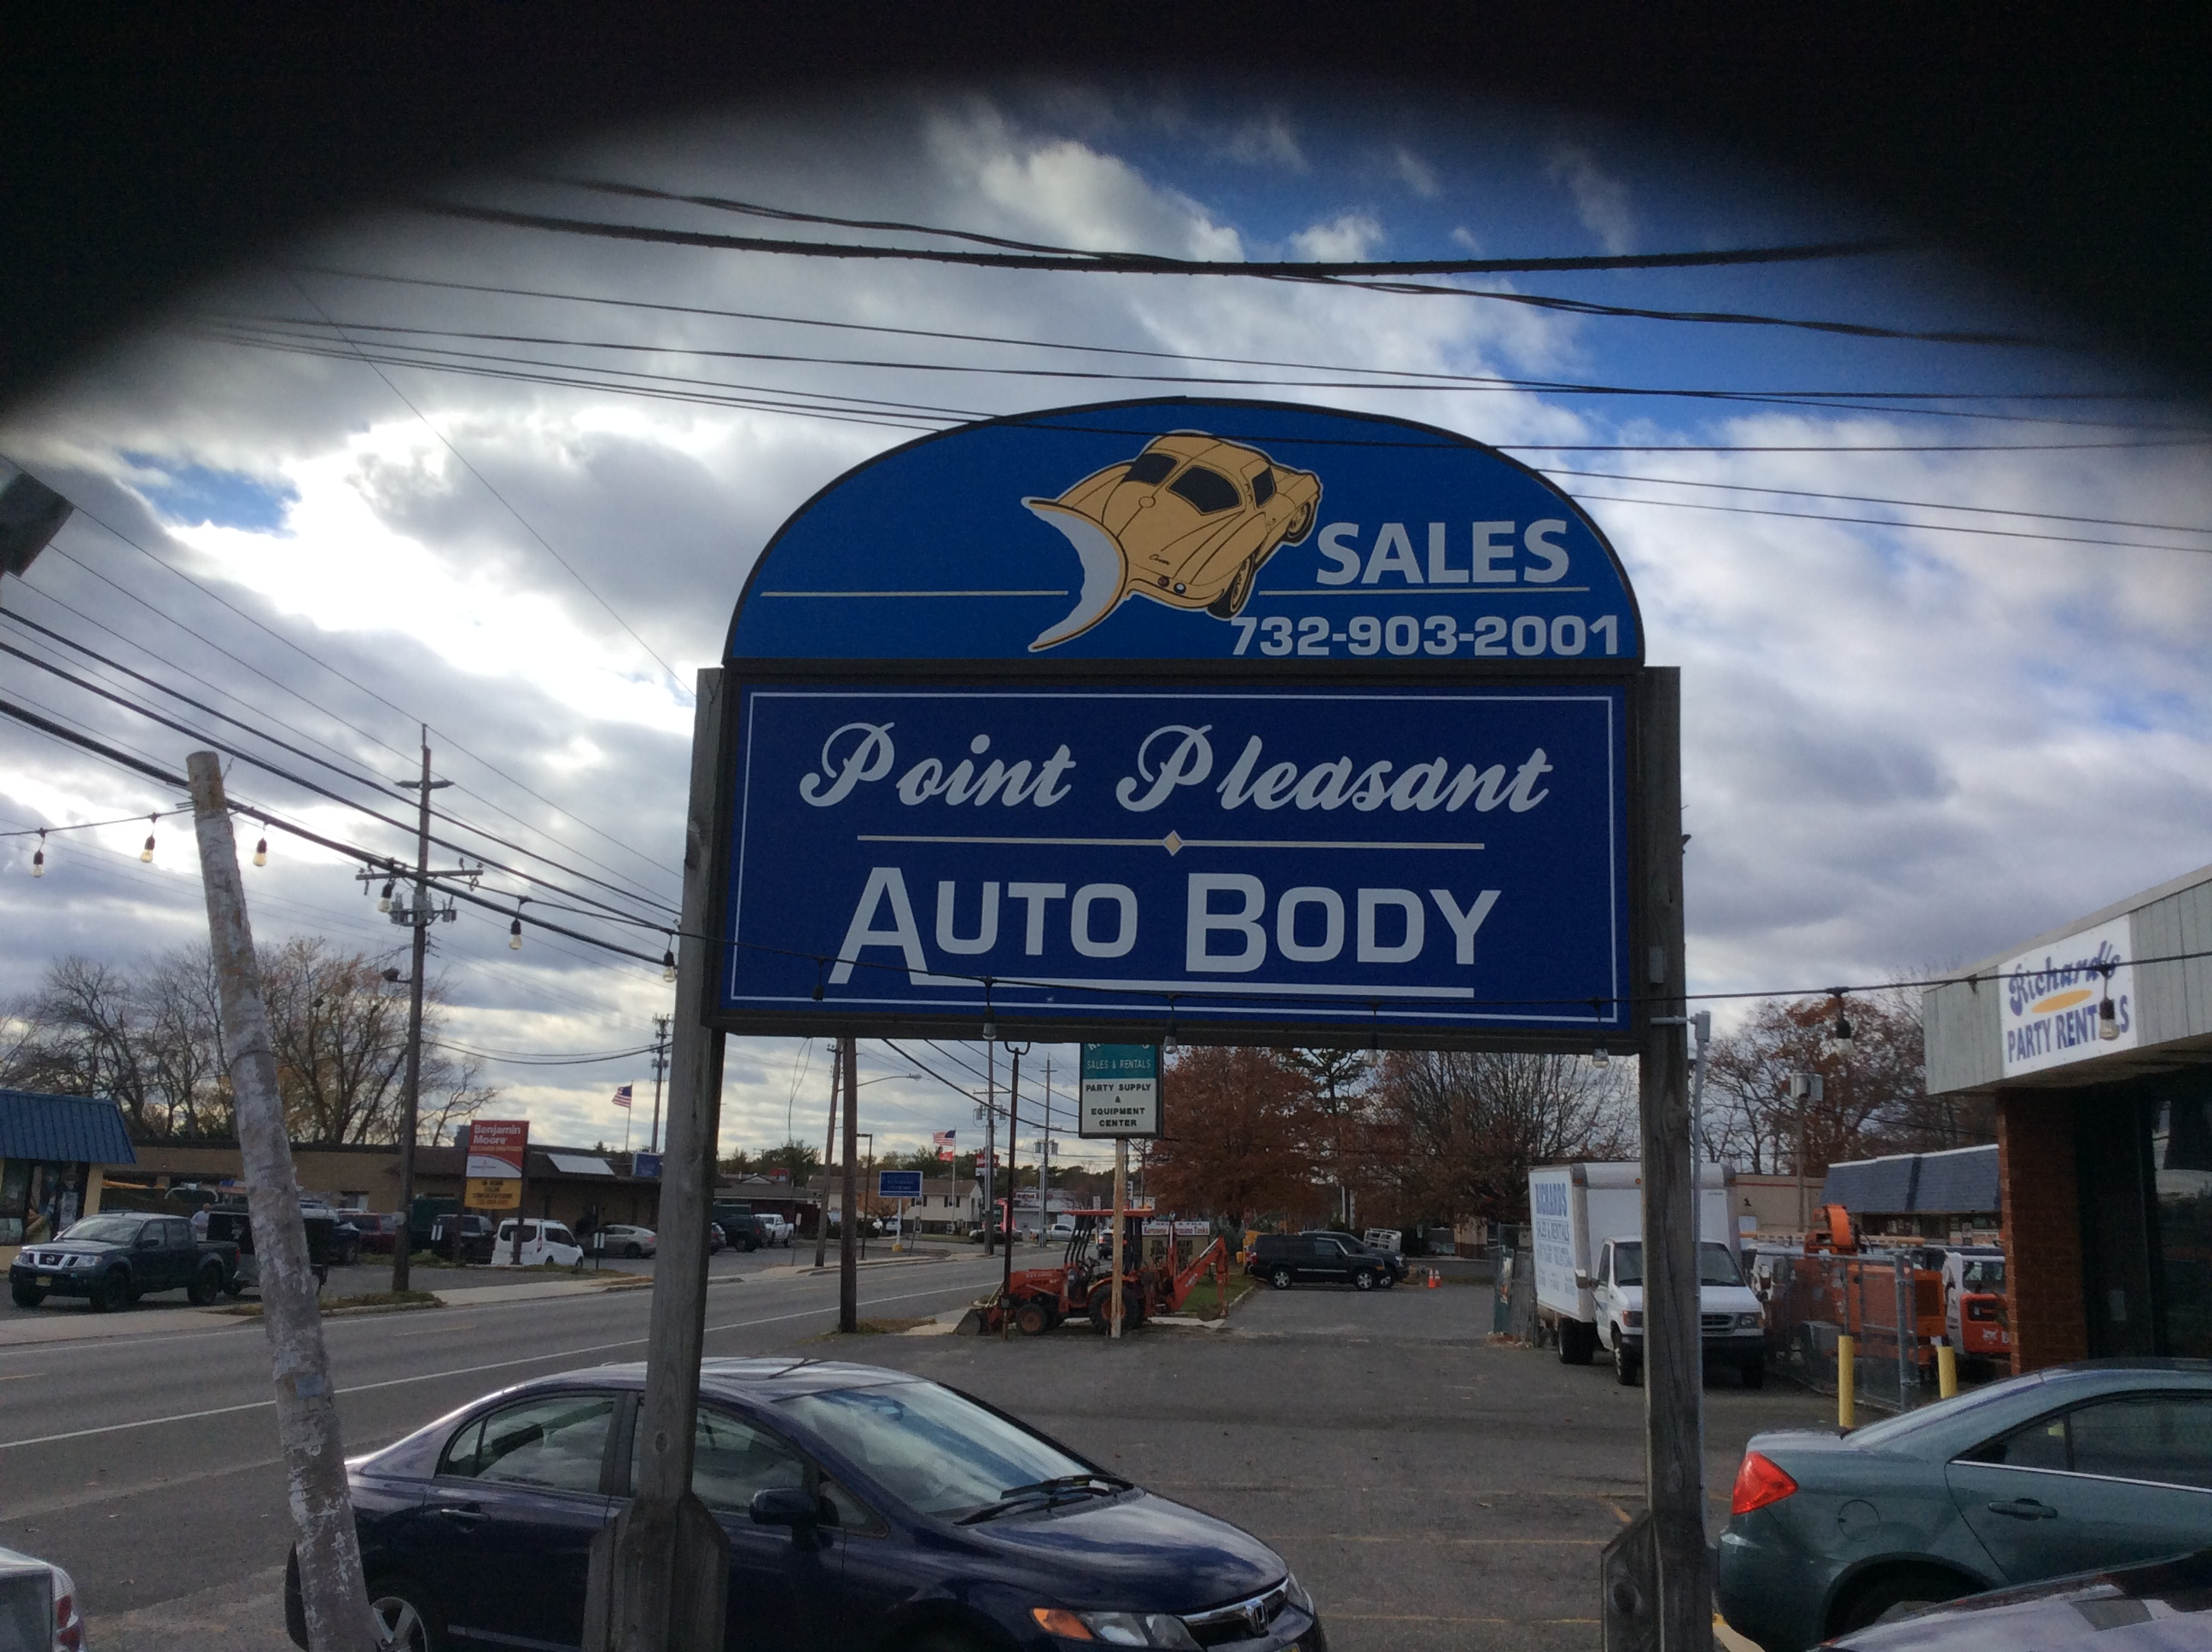 Point Pleasant Auto Body image 1